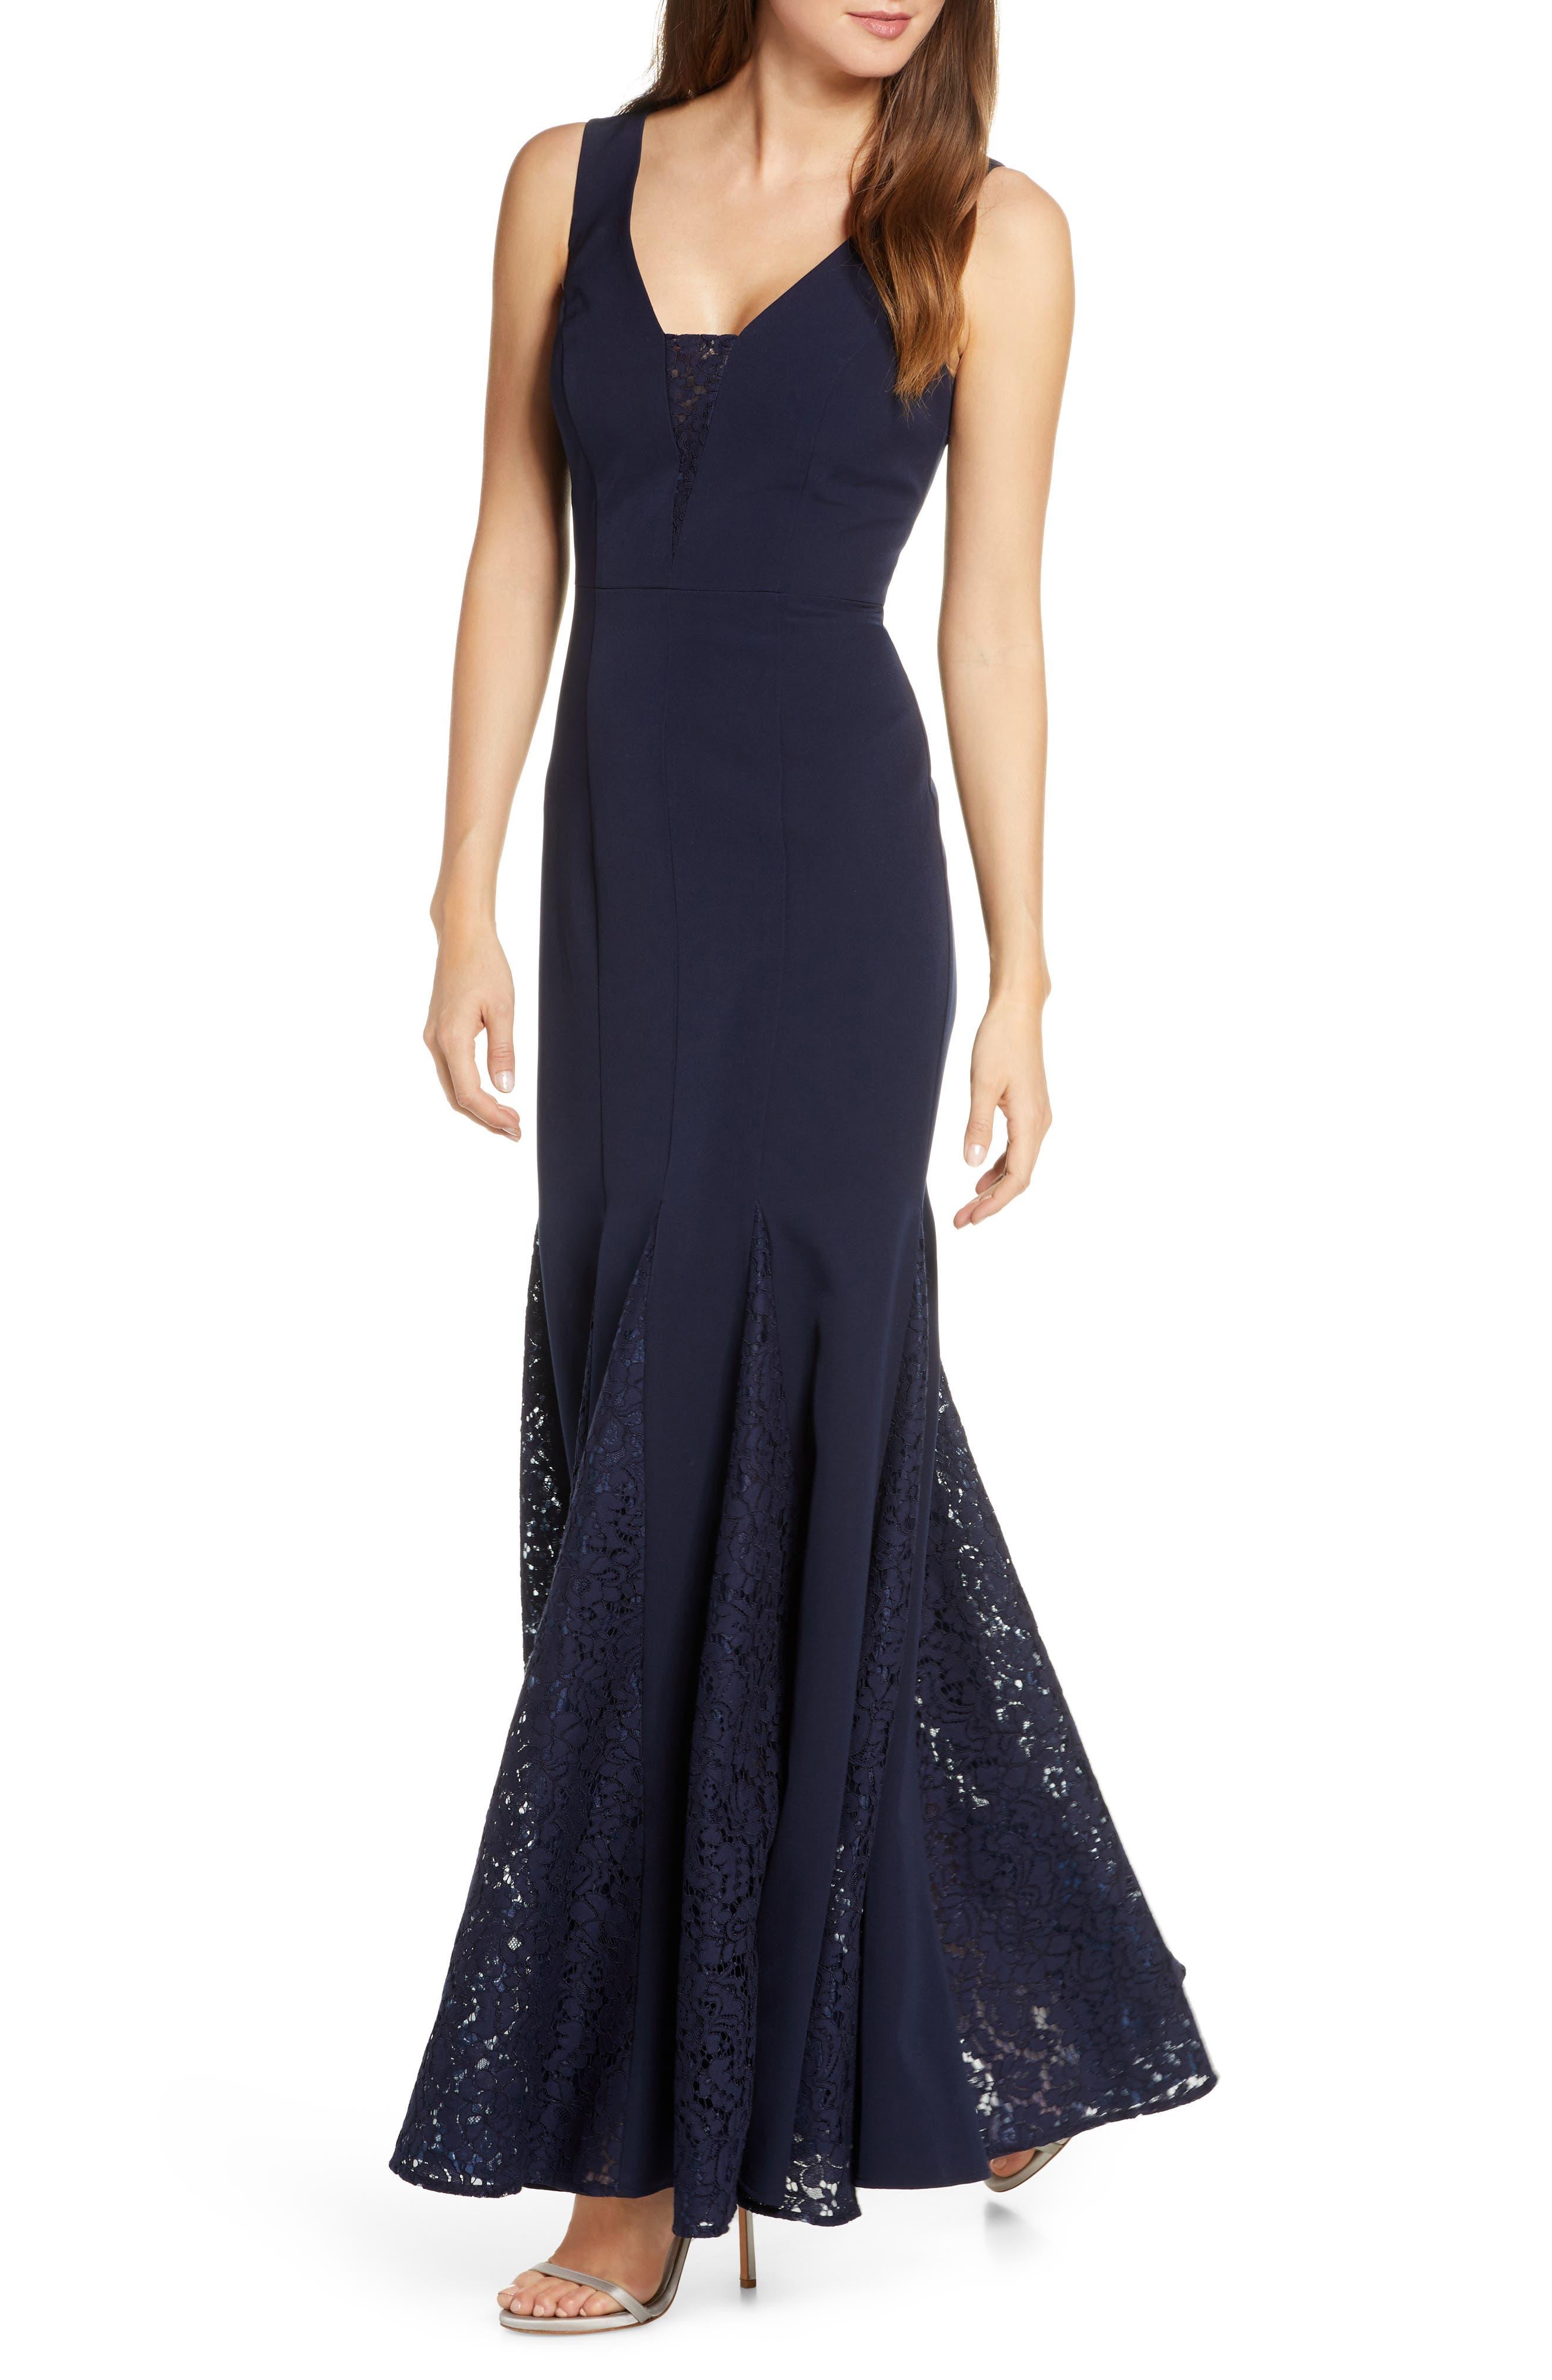 1930s Evening Dresses | Old Hollywood Dress Womens Eliza J Lace Inset Laguna Crepe Trumpet Gown $208.00 AT vintagedancer.com